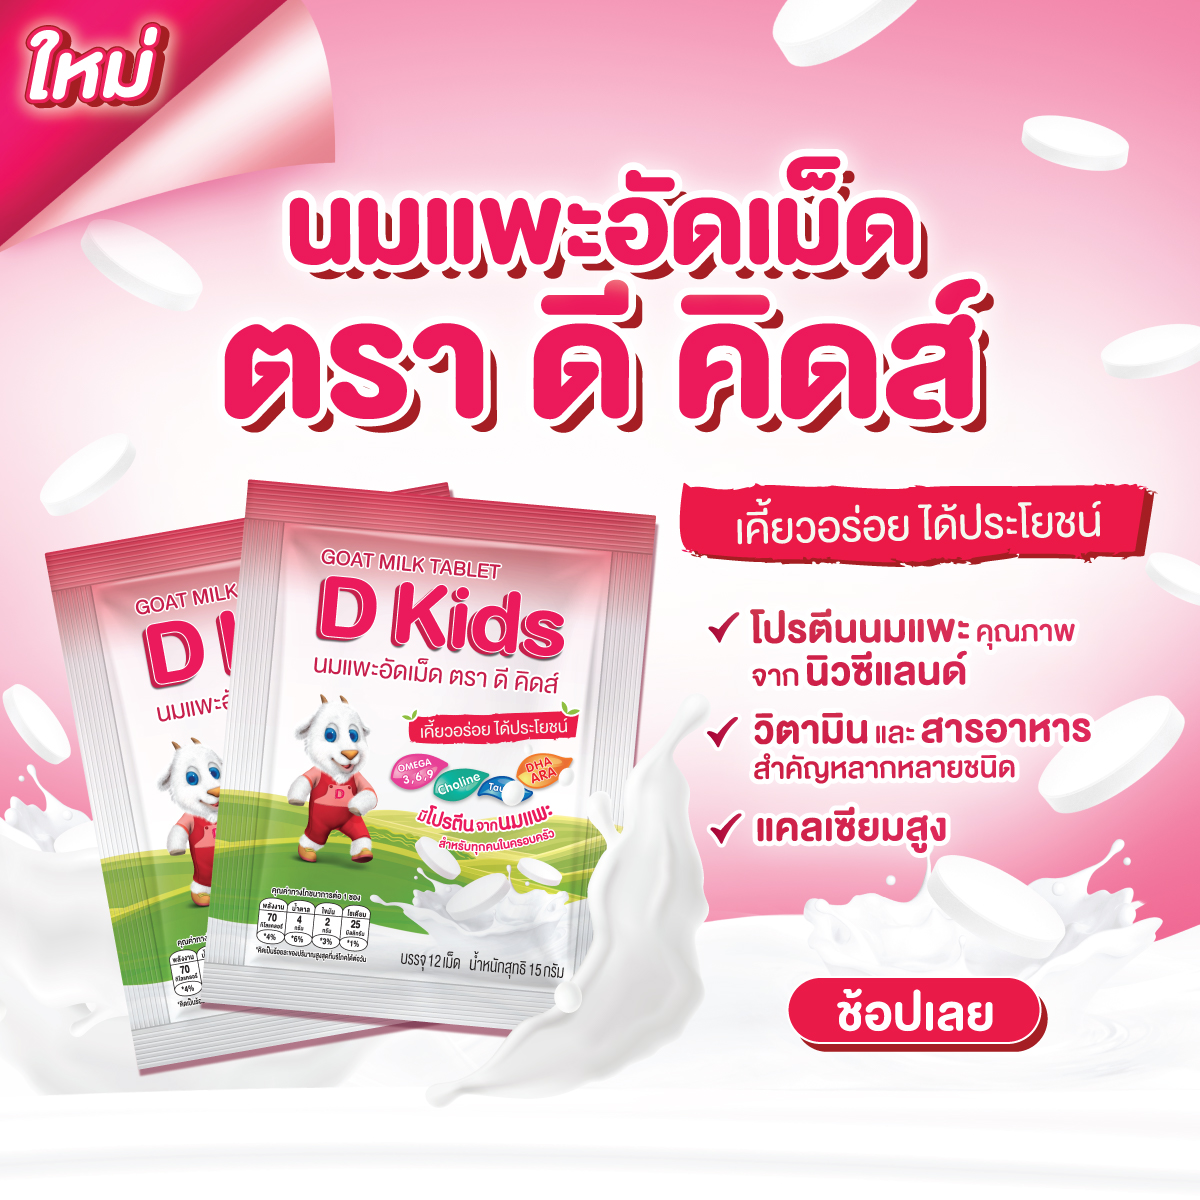 D Kids Goat milk tablet